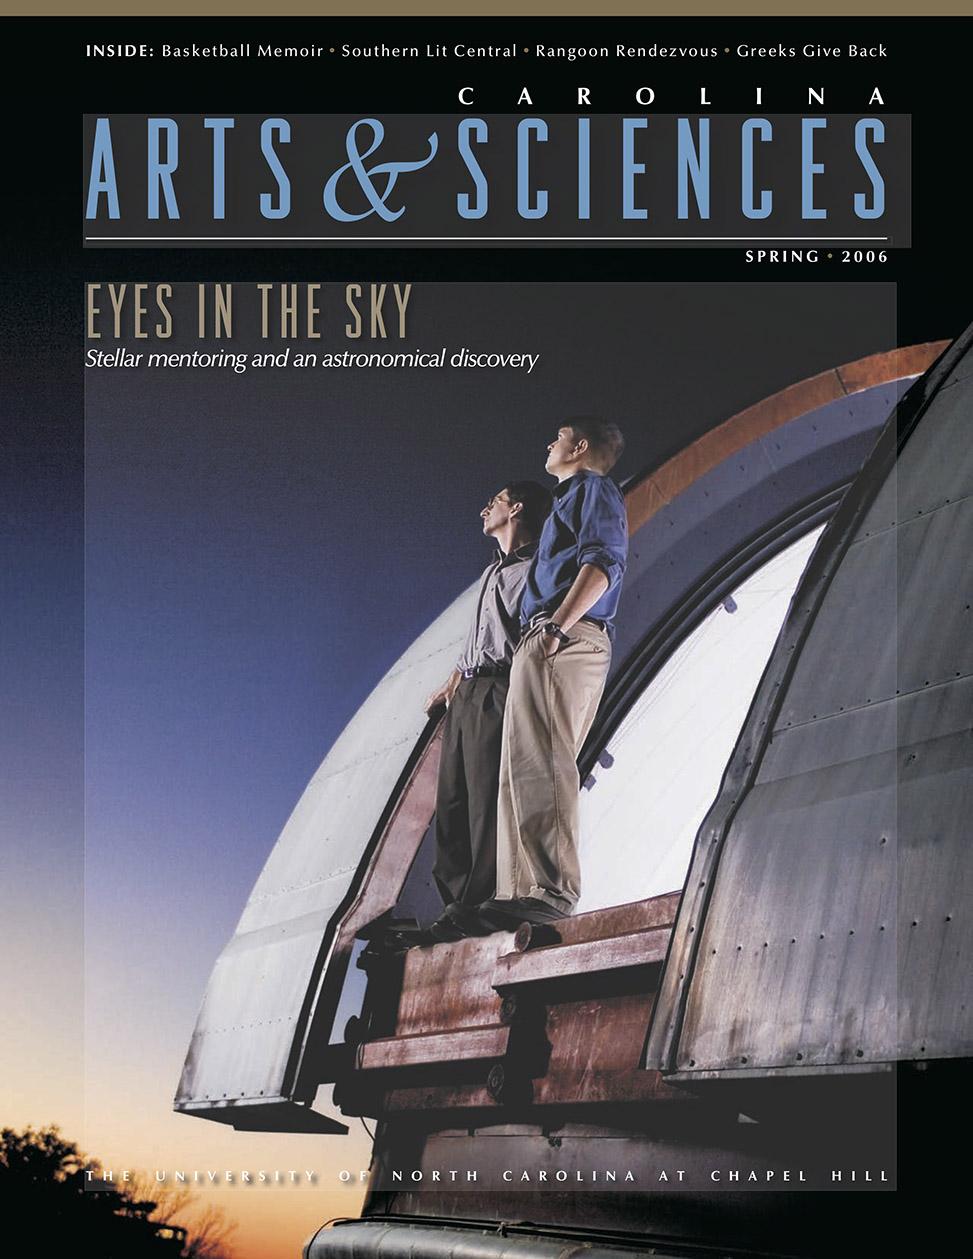 Spring 2006 Magazine Cover